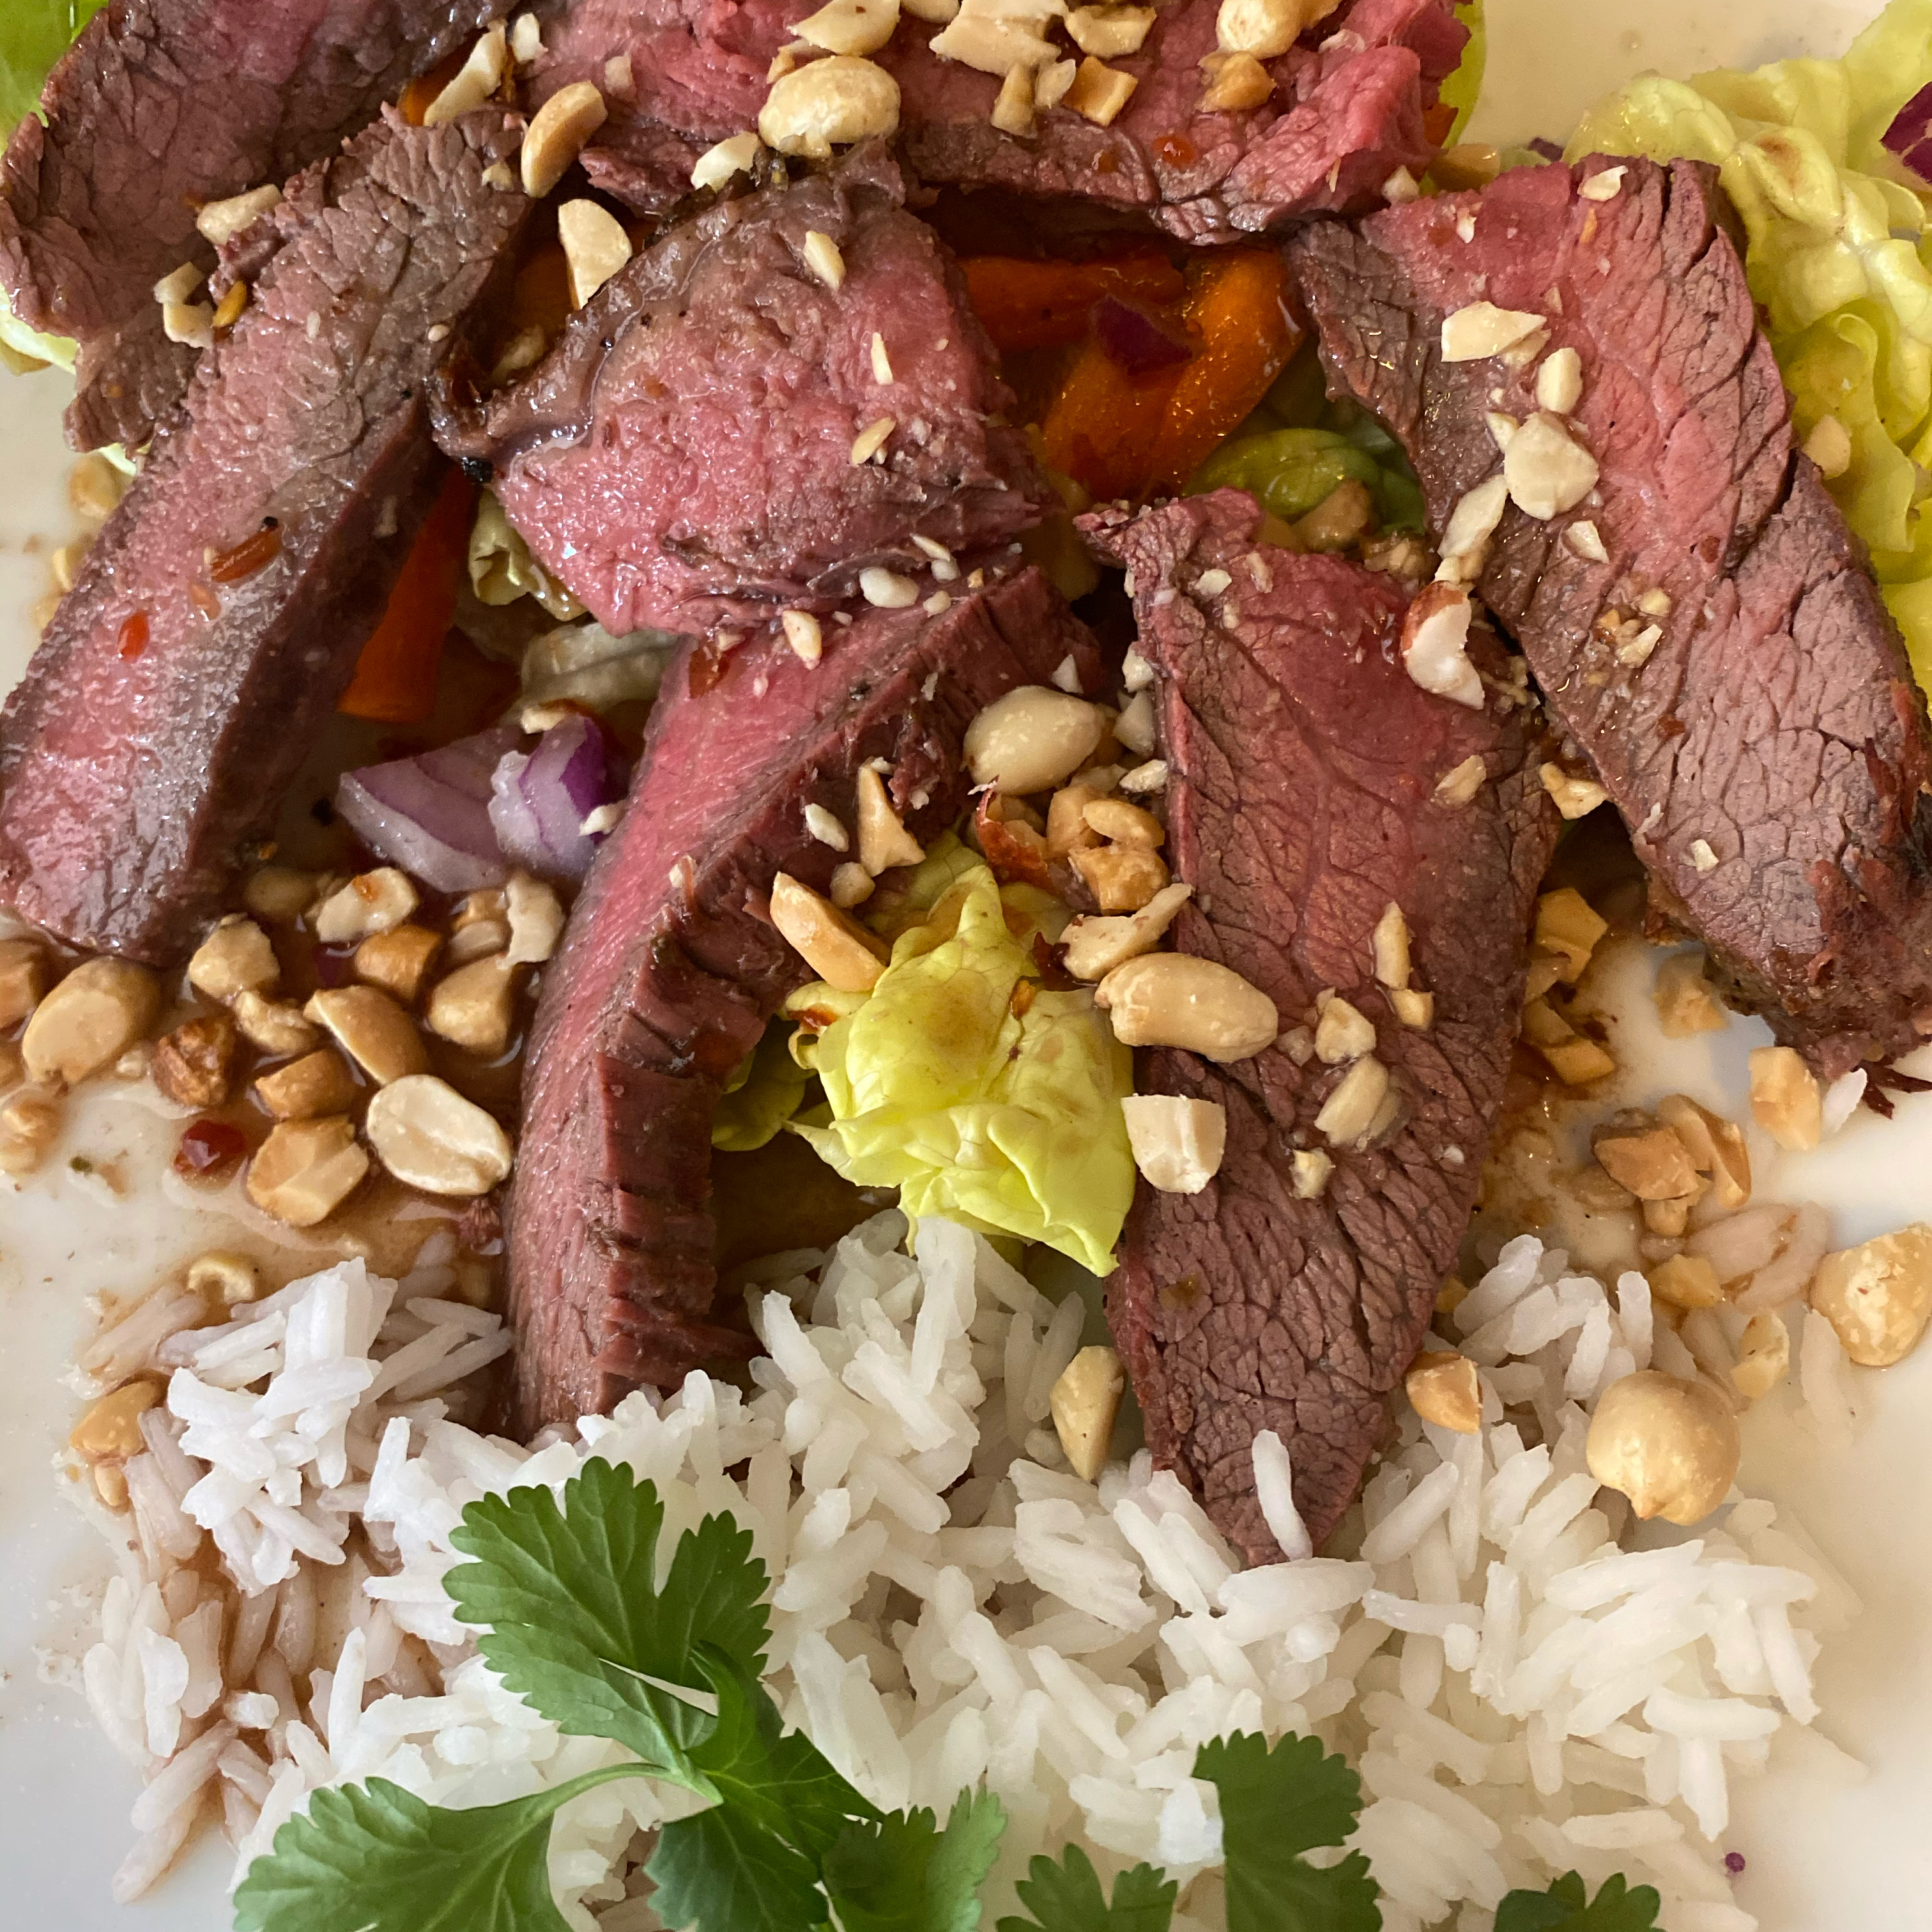 Chef John's Grilled Flap Steak lovetobake/cook